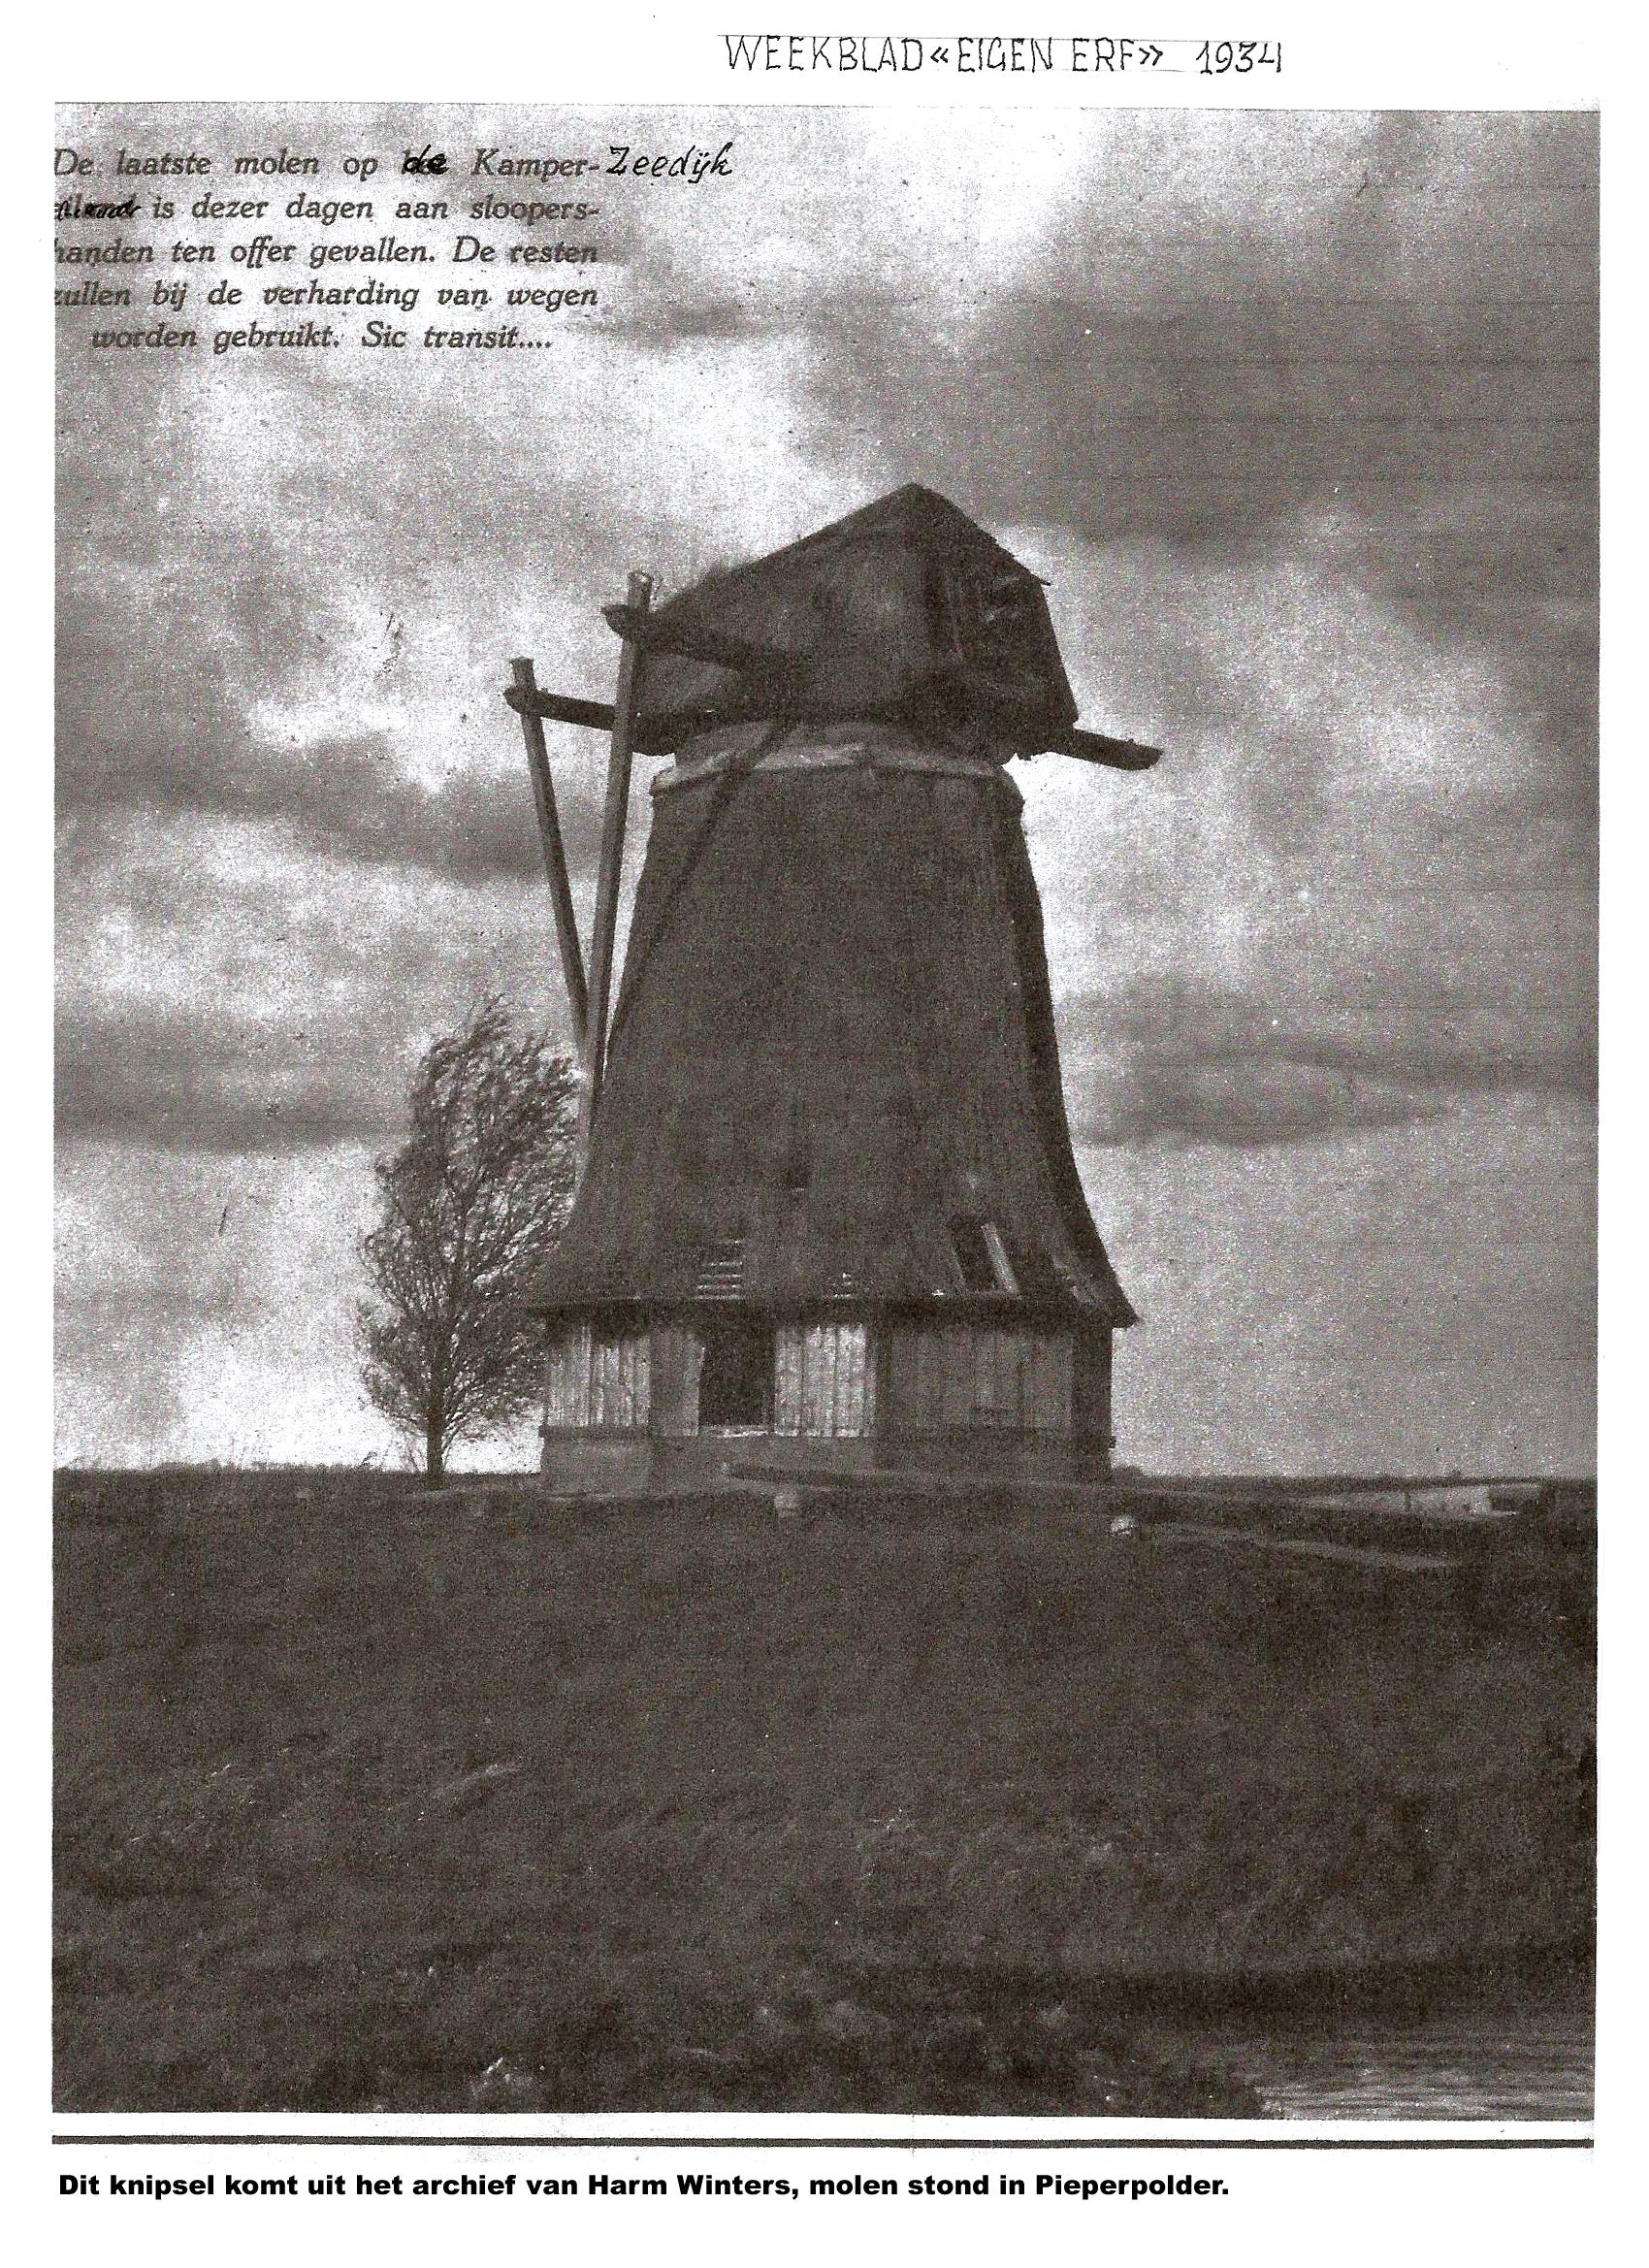 Ons-1934-knipsel-molen-op-de-Piepert